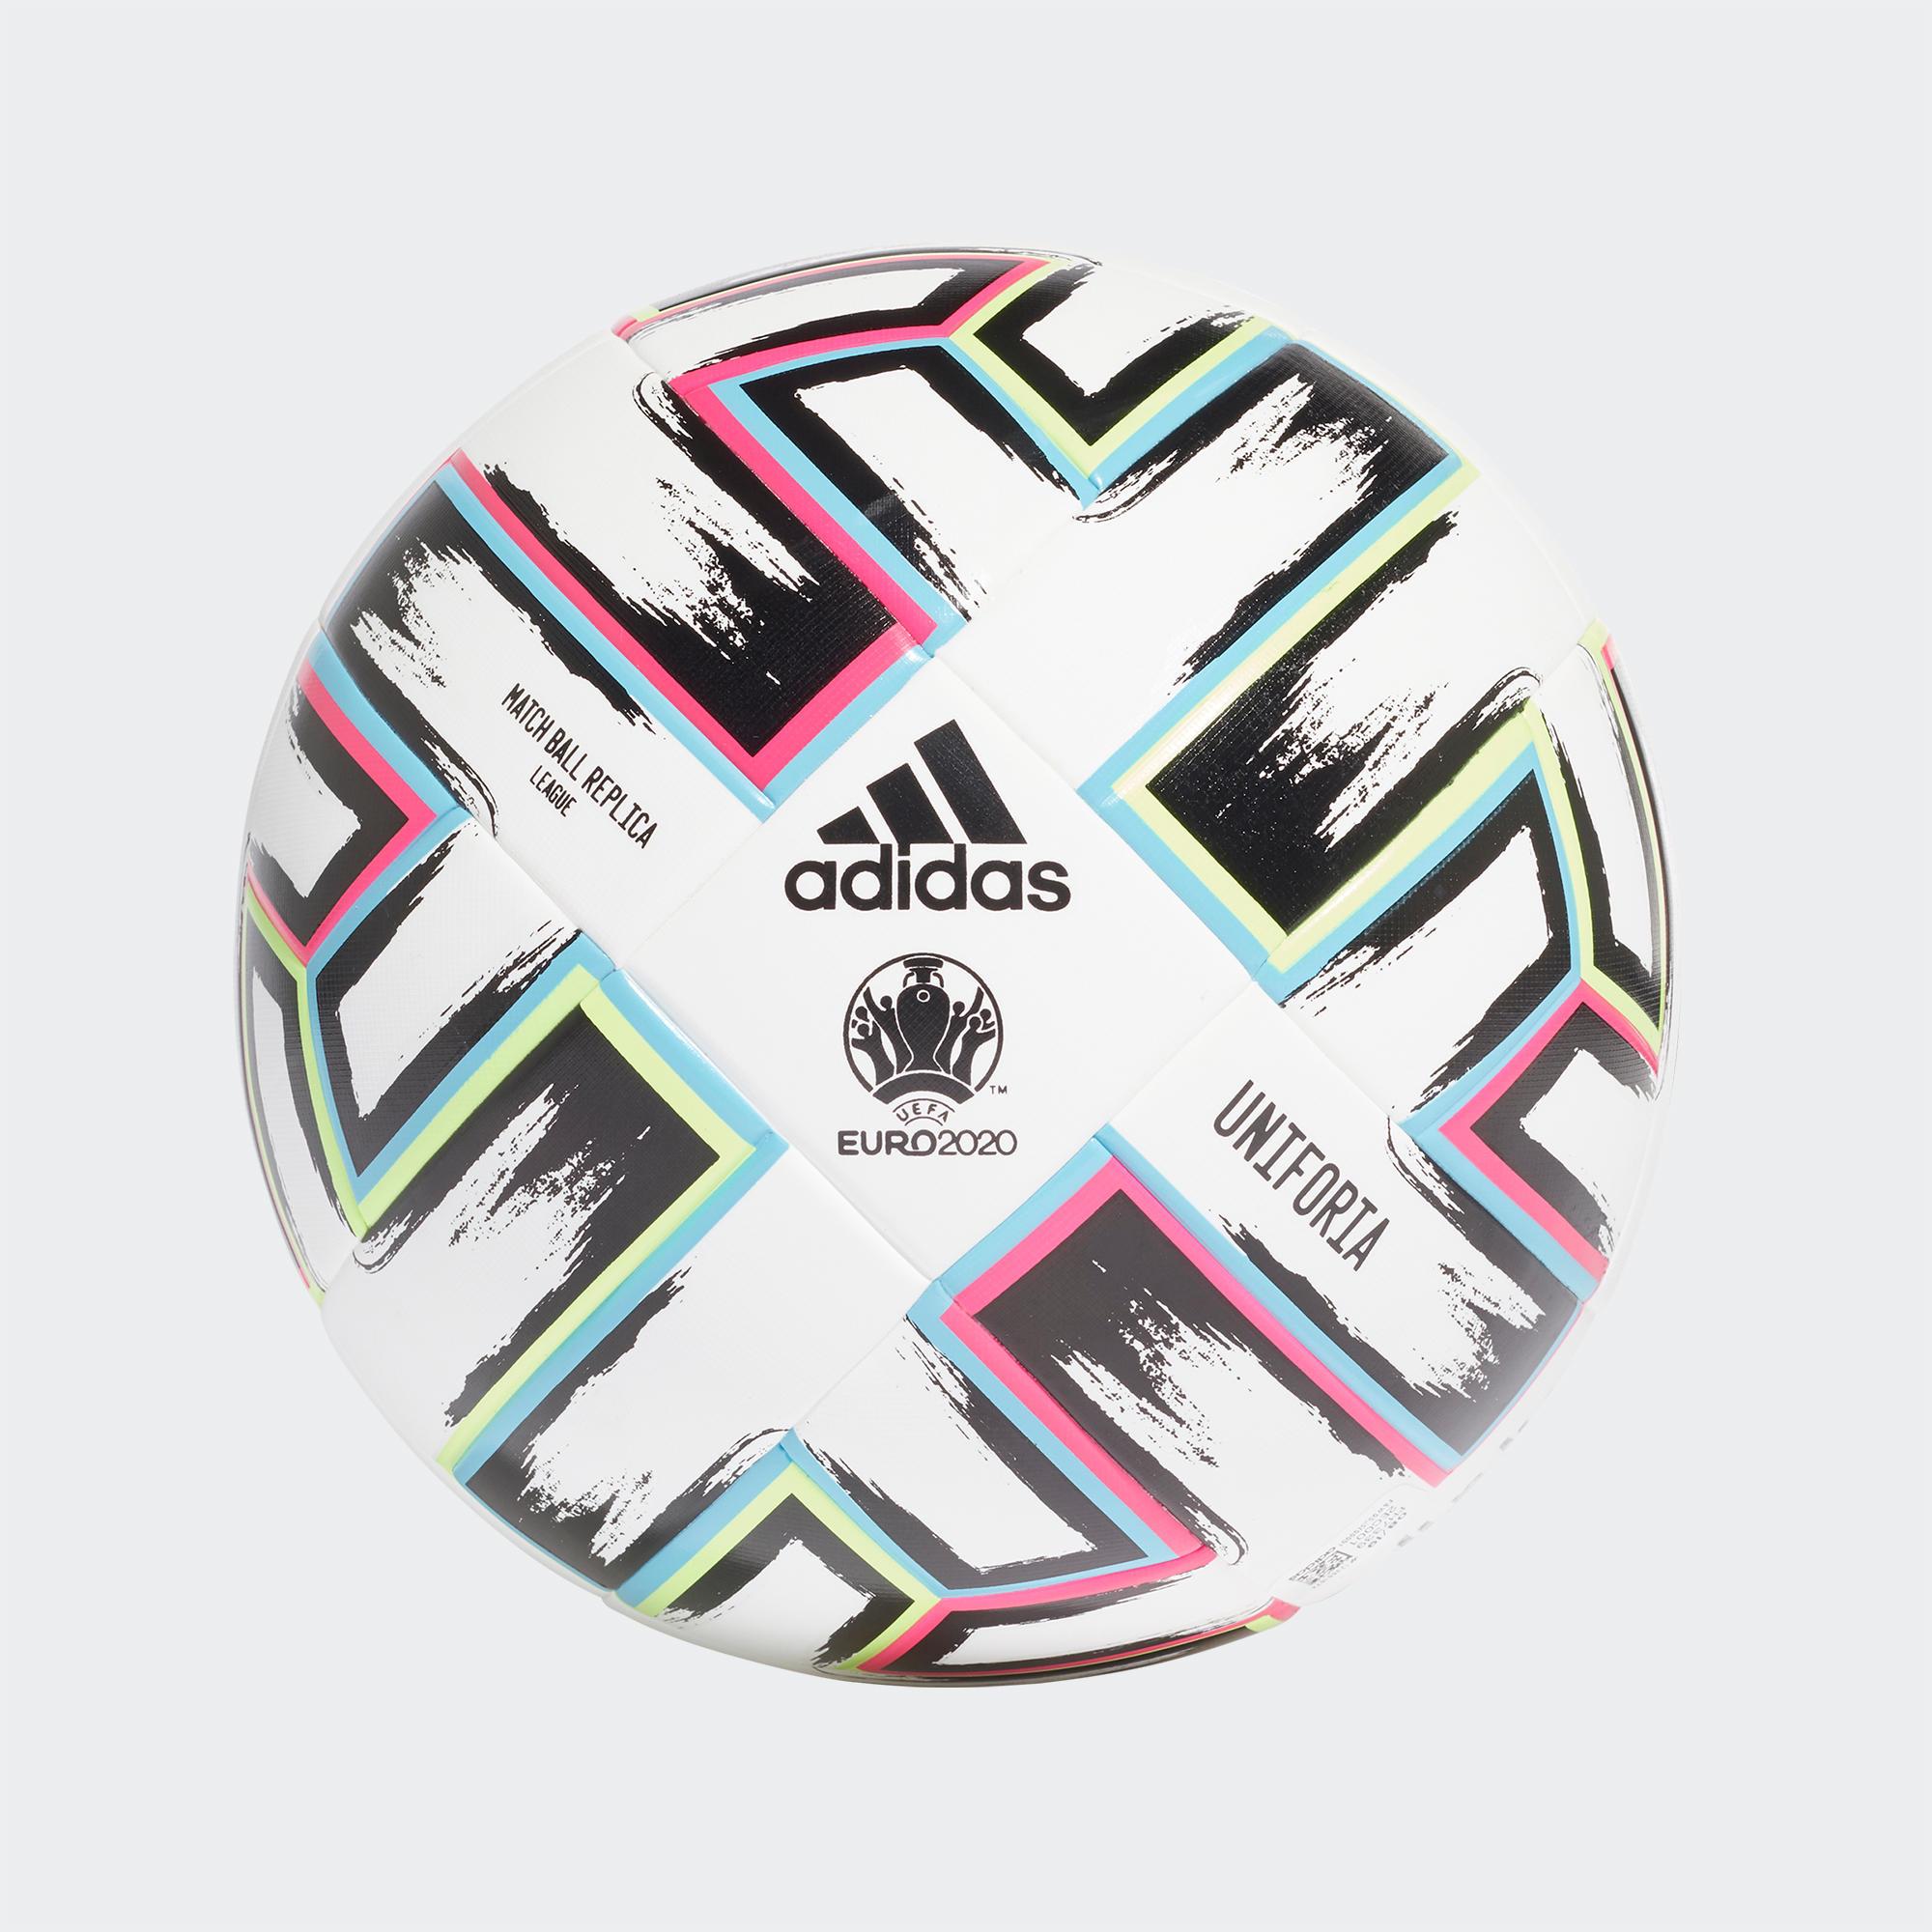 Minge Adidas Replică Euro 2020